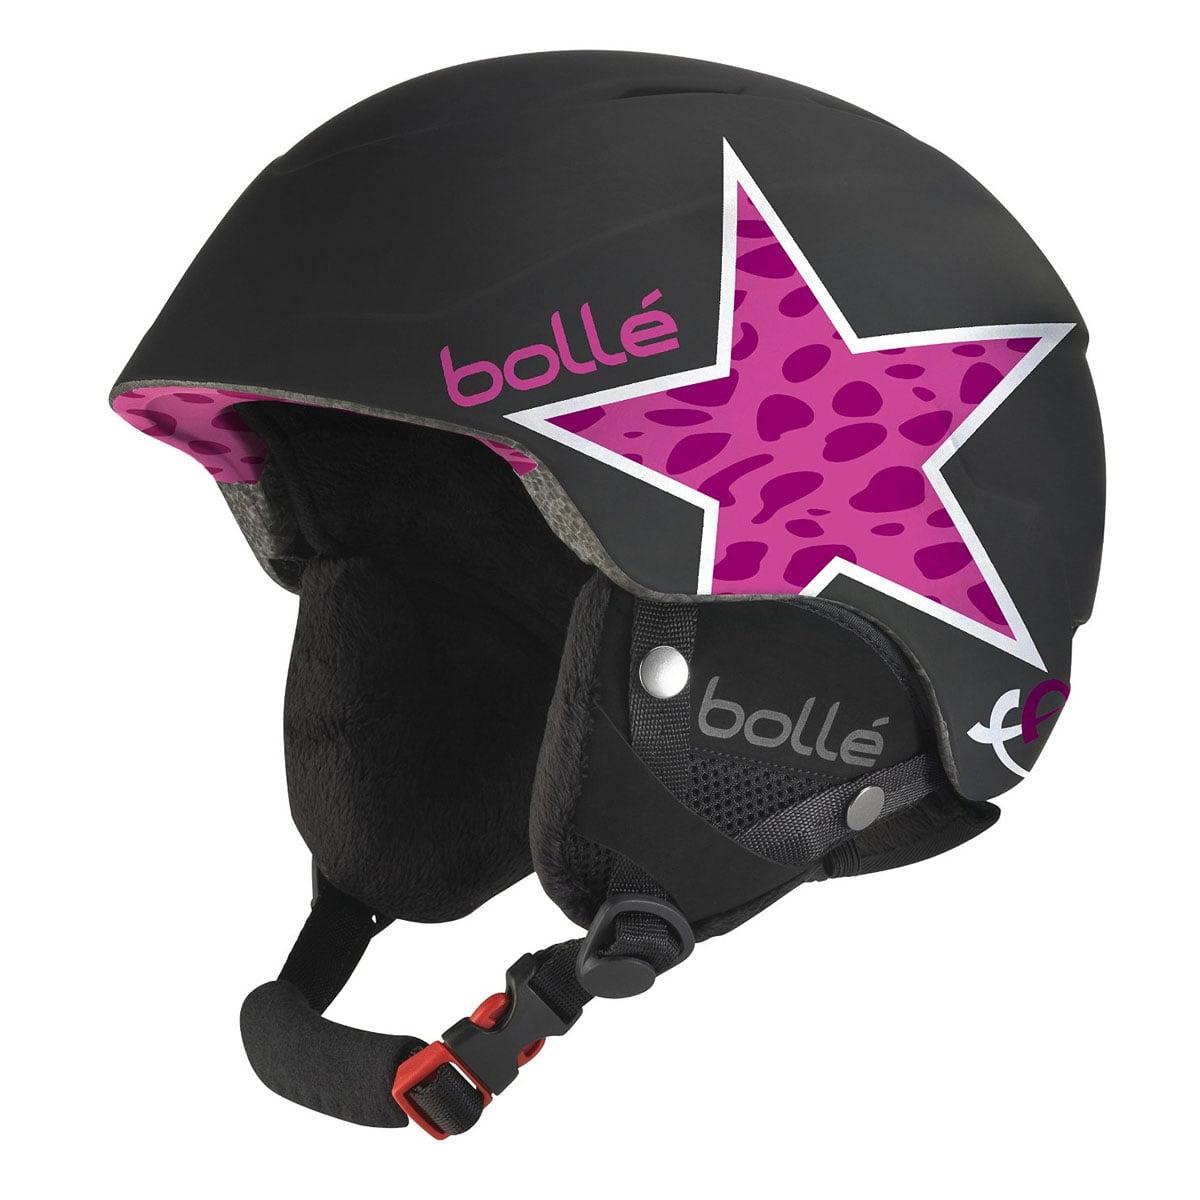 *Bolle Helmets 31008 Anna Fenninger Series 53-58cm B-Lieve by Bolle